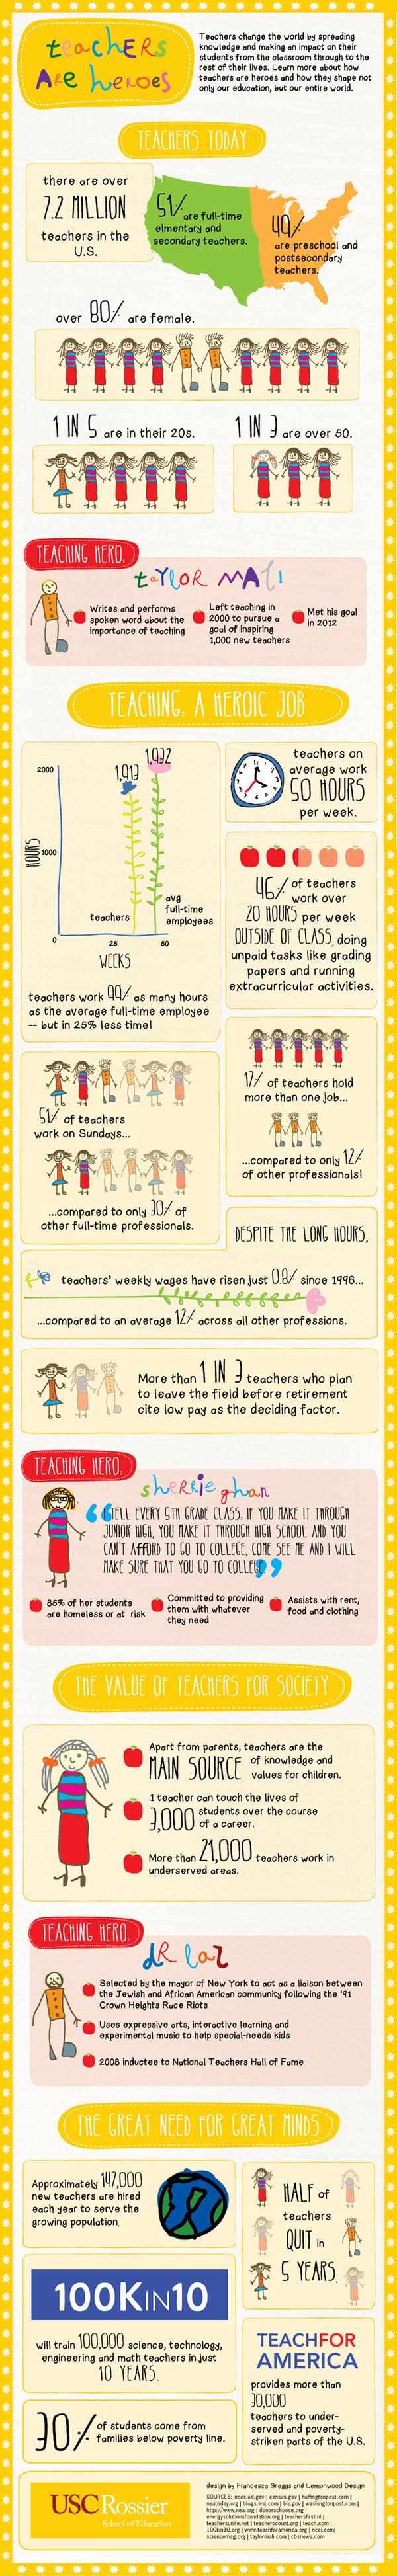 Teacher Appreciation Statistics